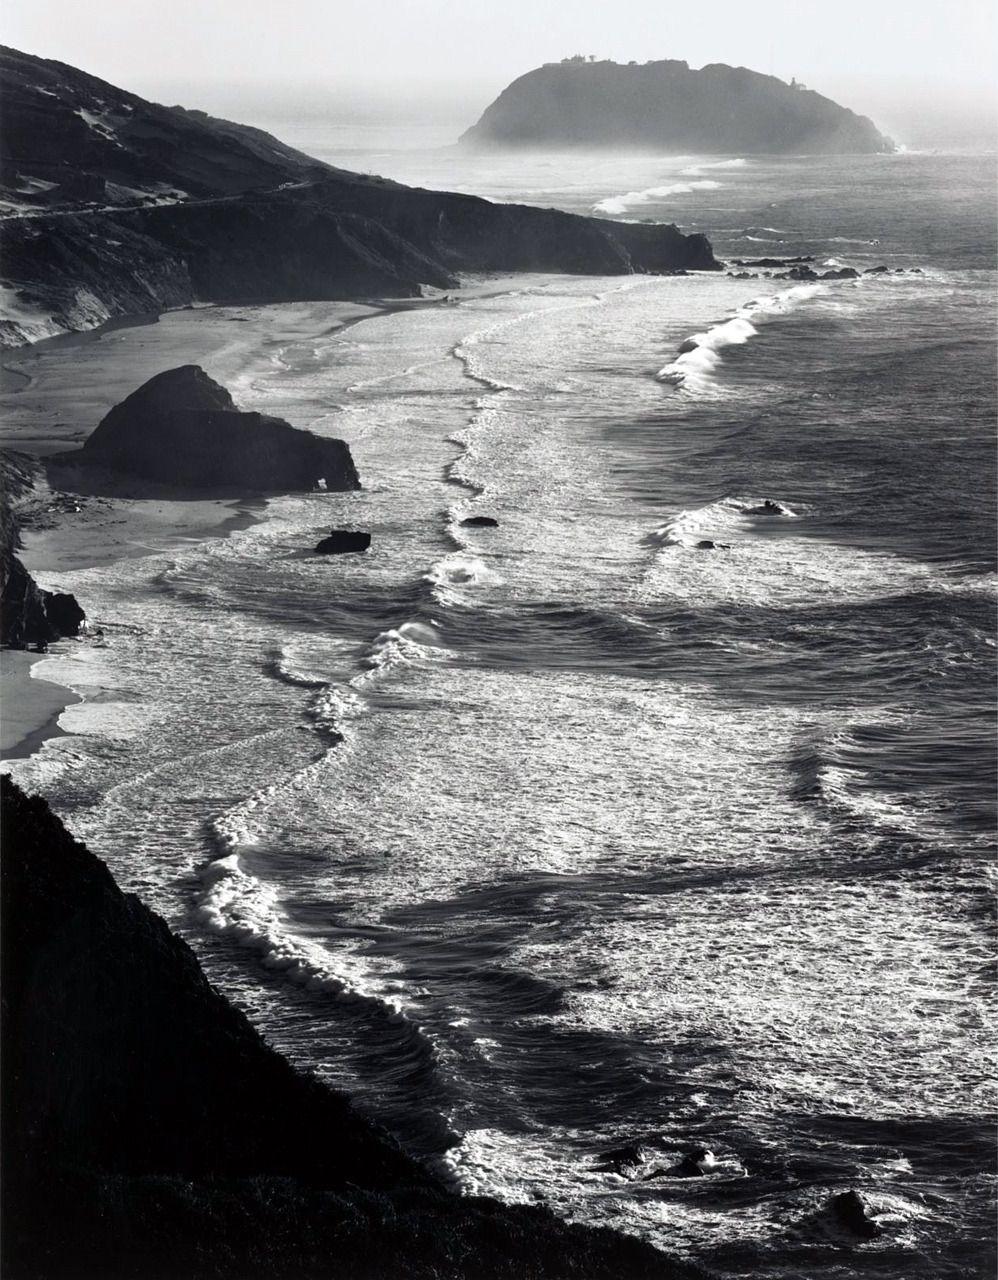 Ansel Adams, Storm, Point Sur, Monterey Coast, California, 1942 ...